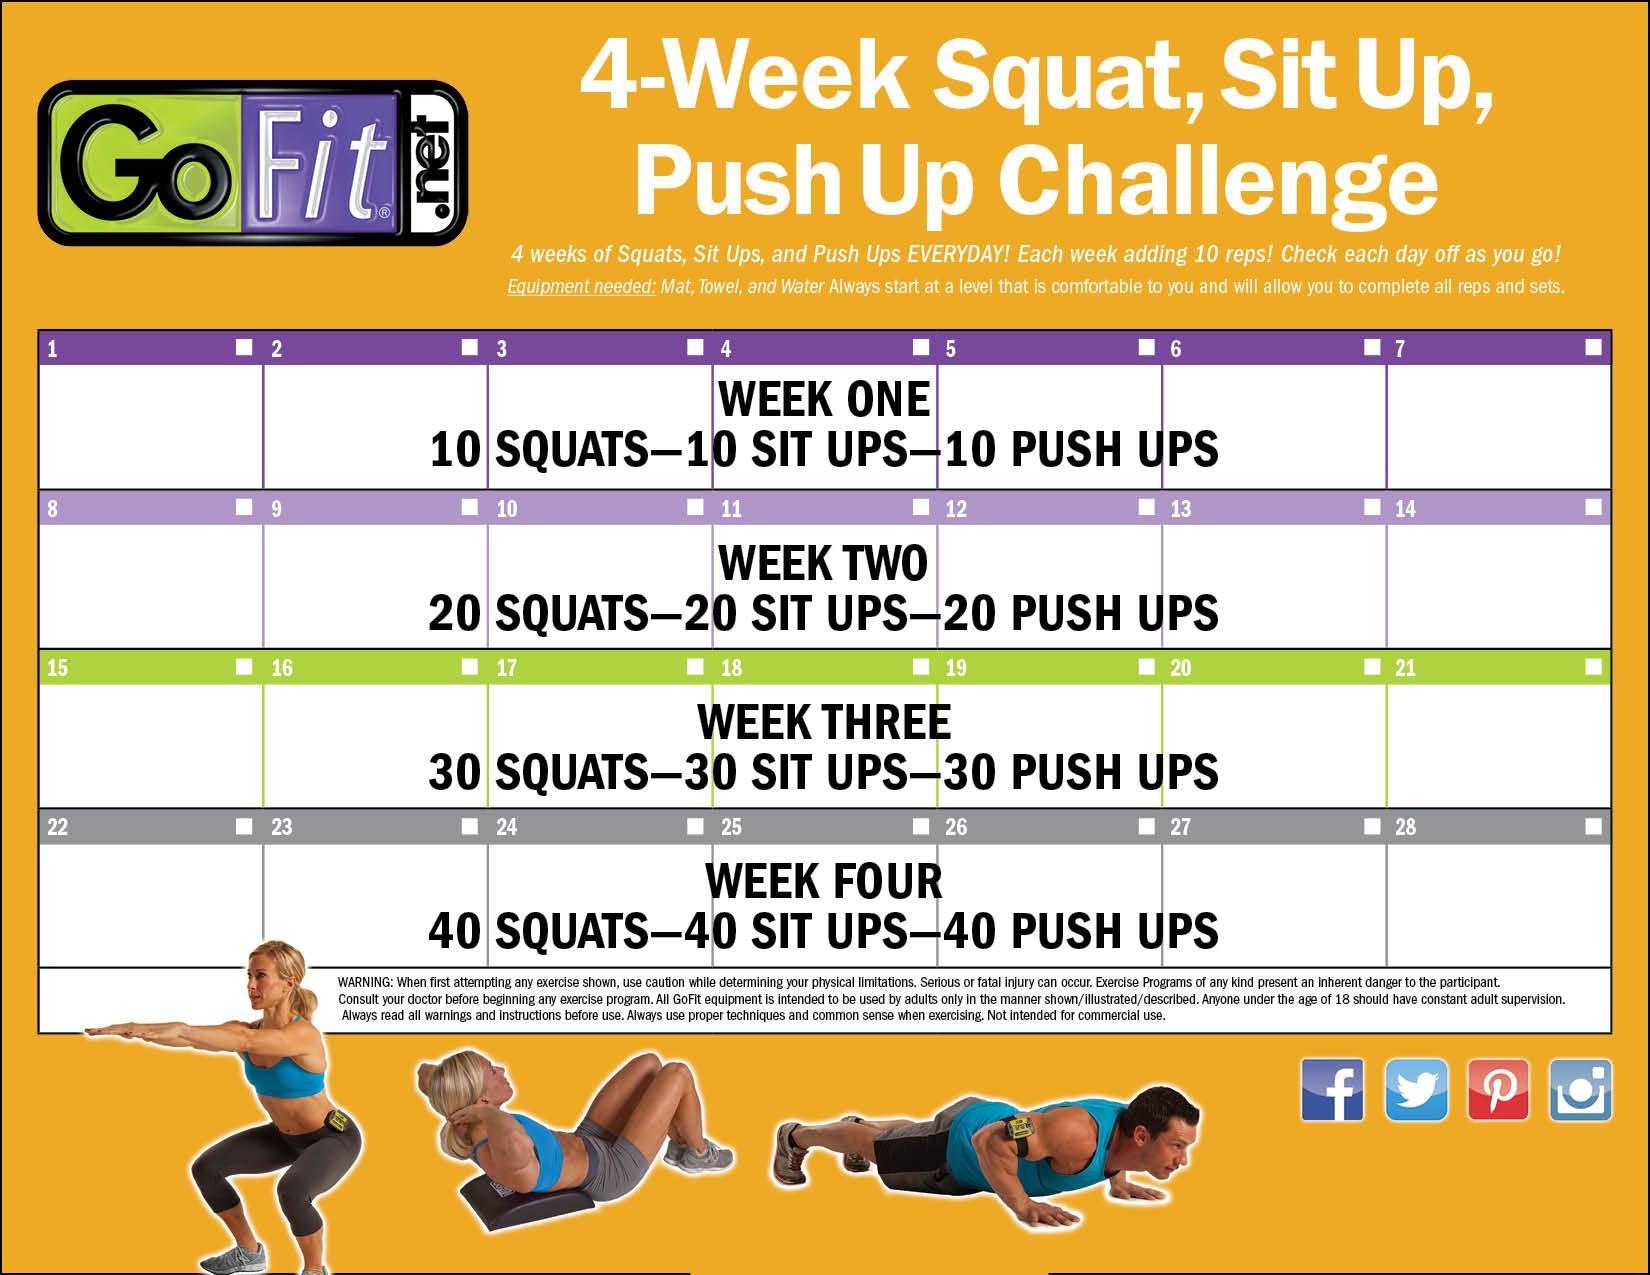 4 Week Squat Sit Ups And Push Ups Calendar Push Up Challenge Sit Up Push Up